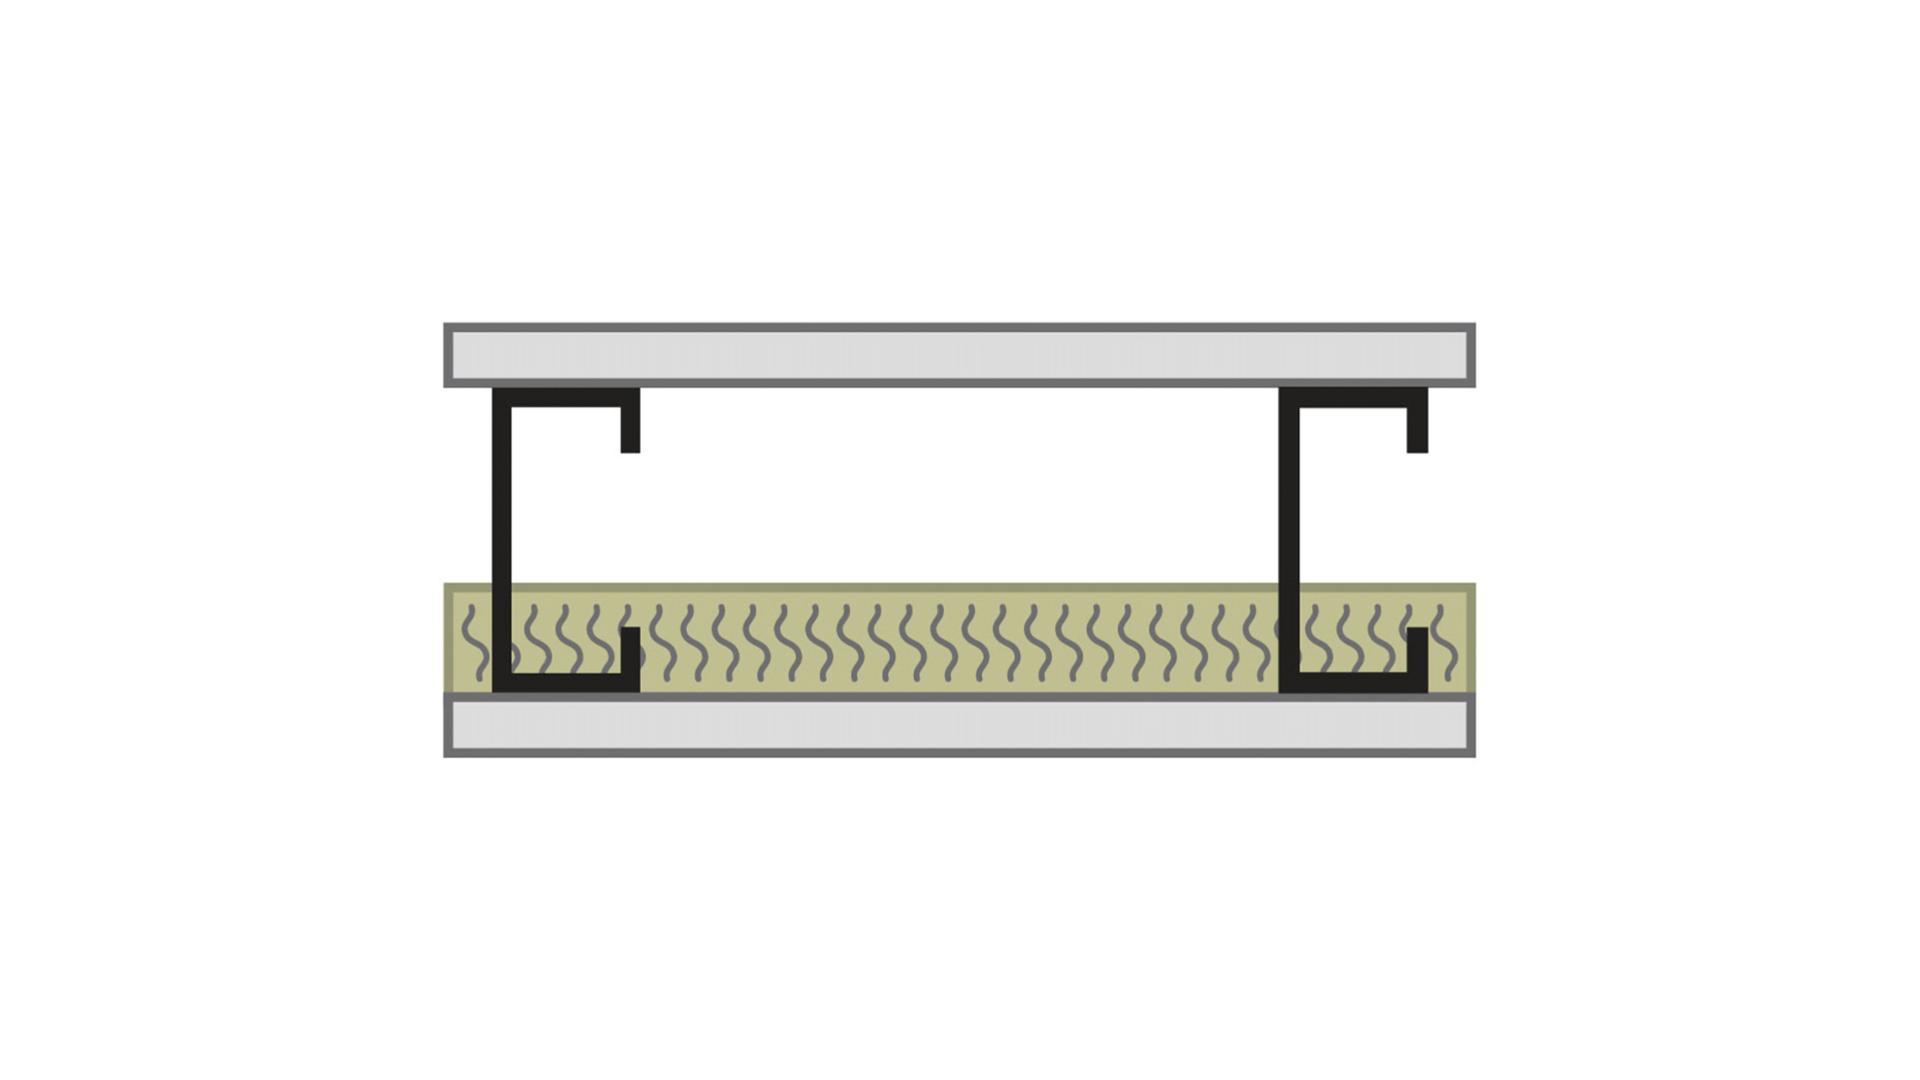 RFN-NA, optimized acoustics, sound blocking, alternate wall assembly STC 45 -1